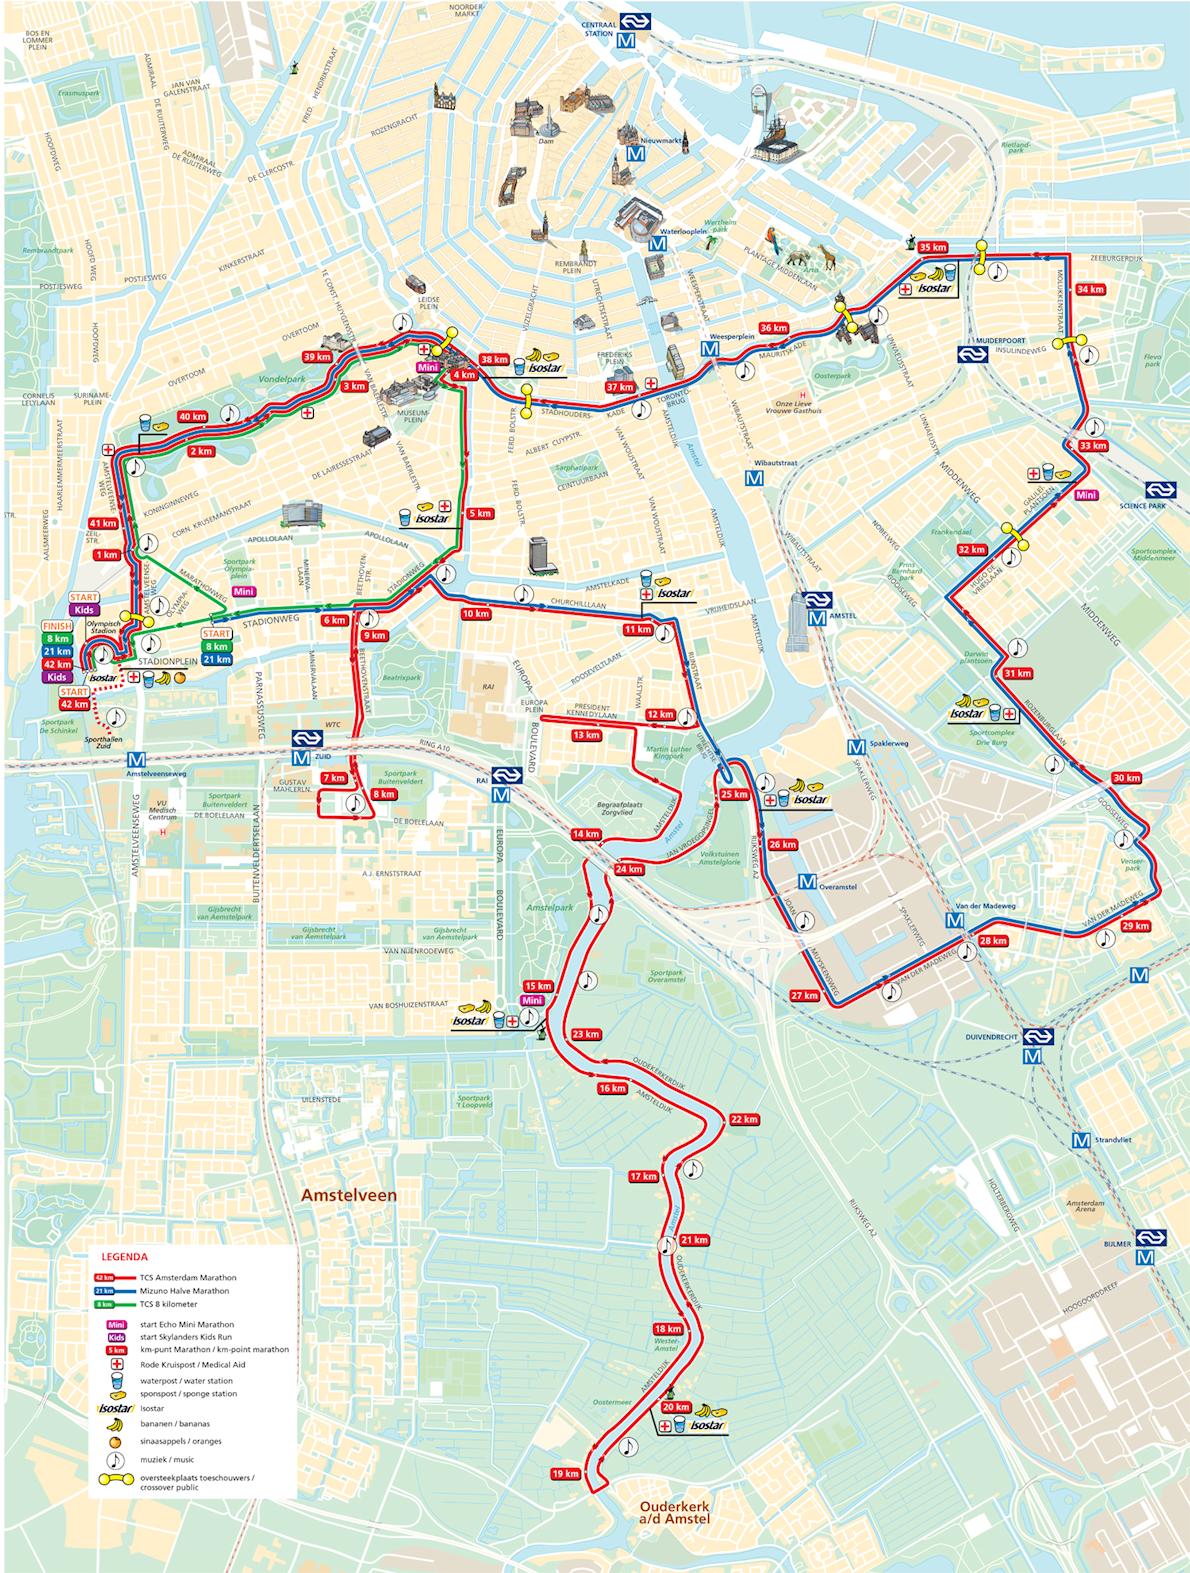 TCS Amsterdam Marathon MAPA DEL RECORRIDO DE